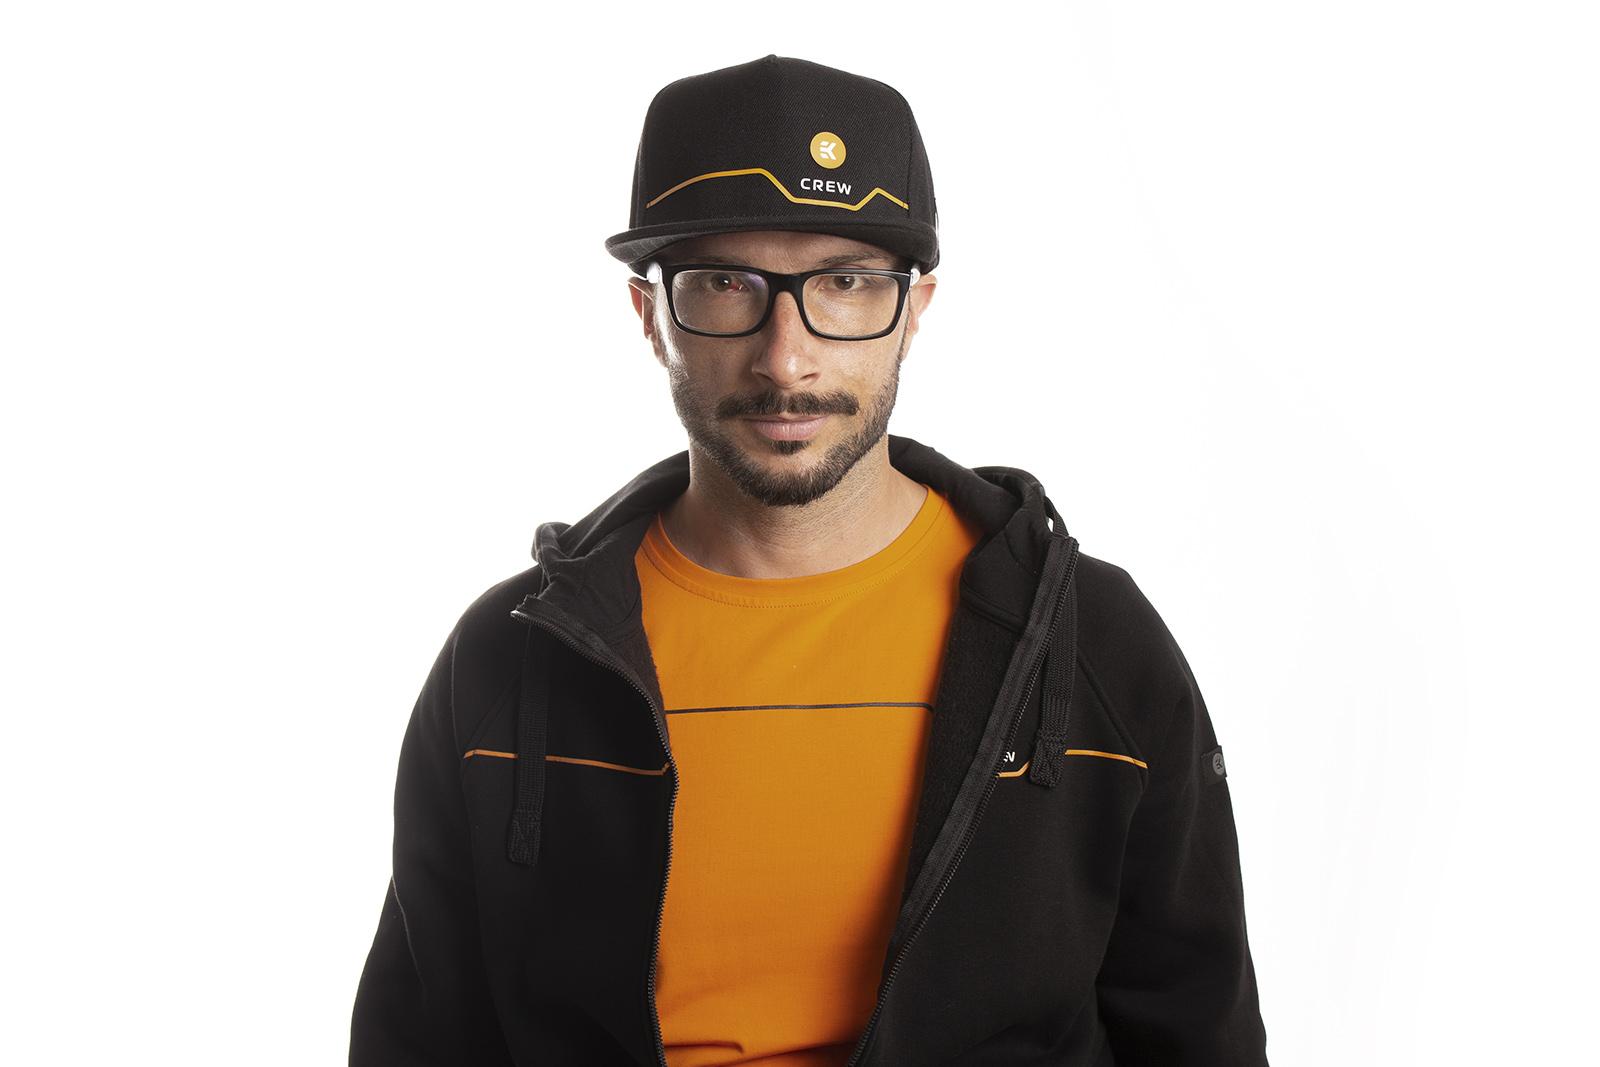 EK-Crew_Black_Snapback_Cap_3